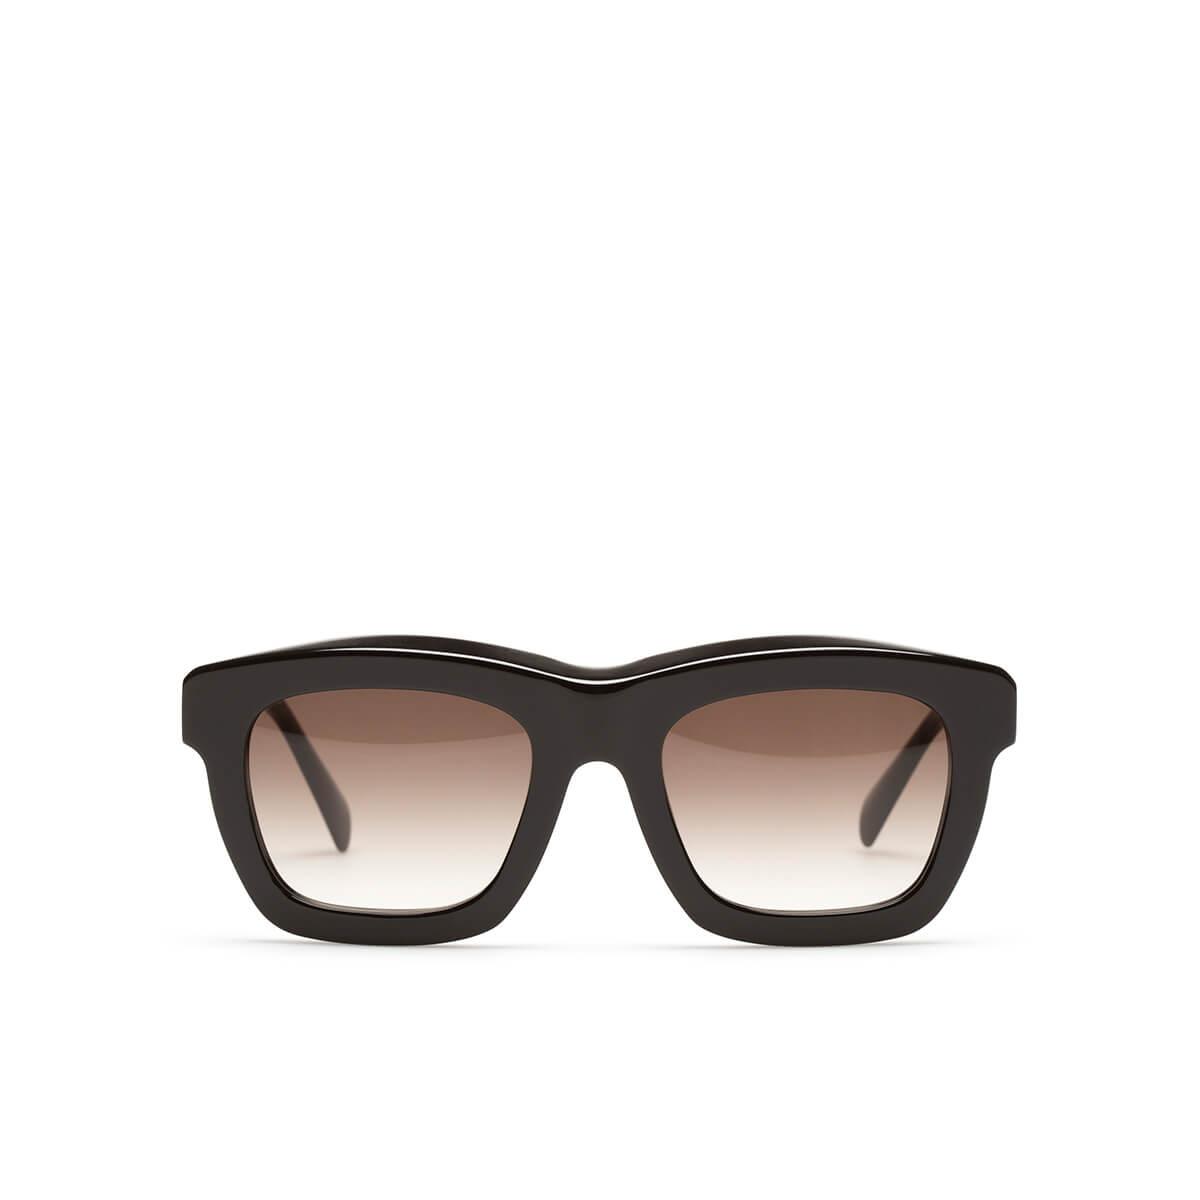 Kuboraum C2 Bs Sunglasses